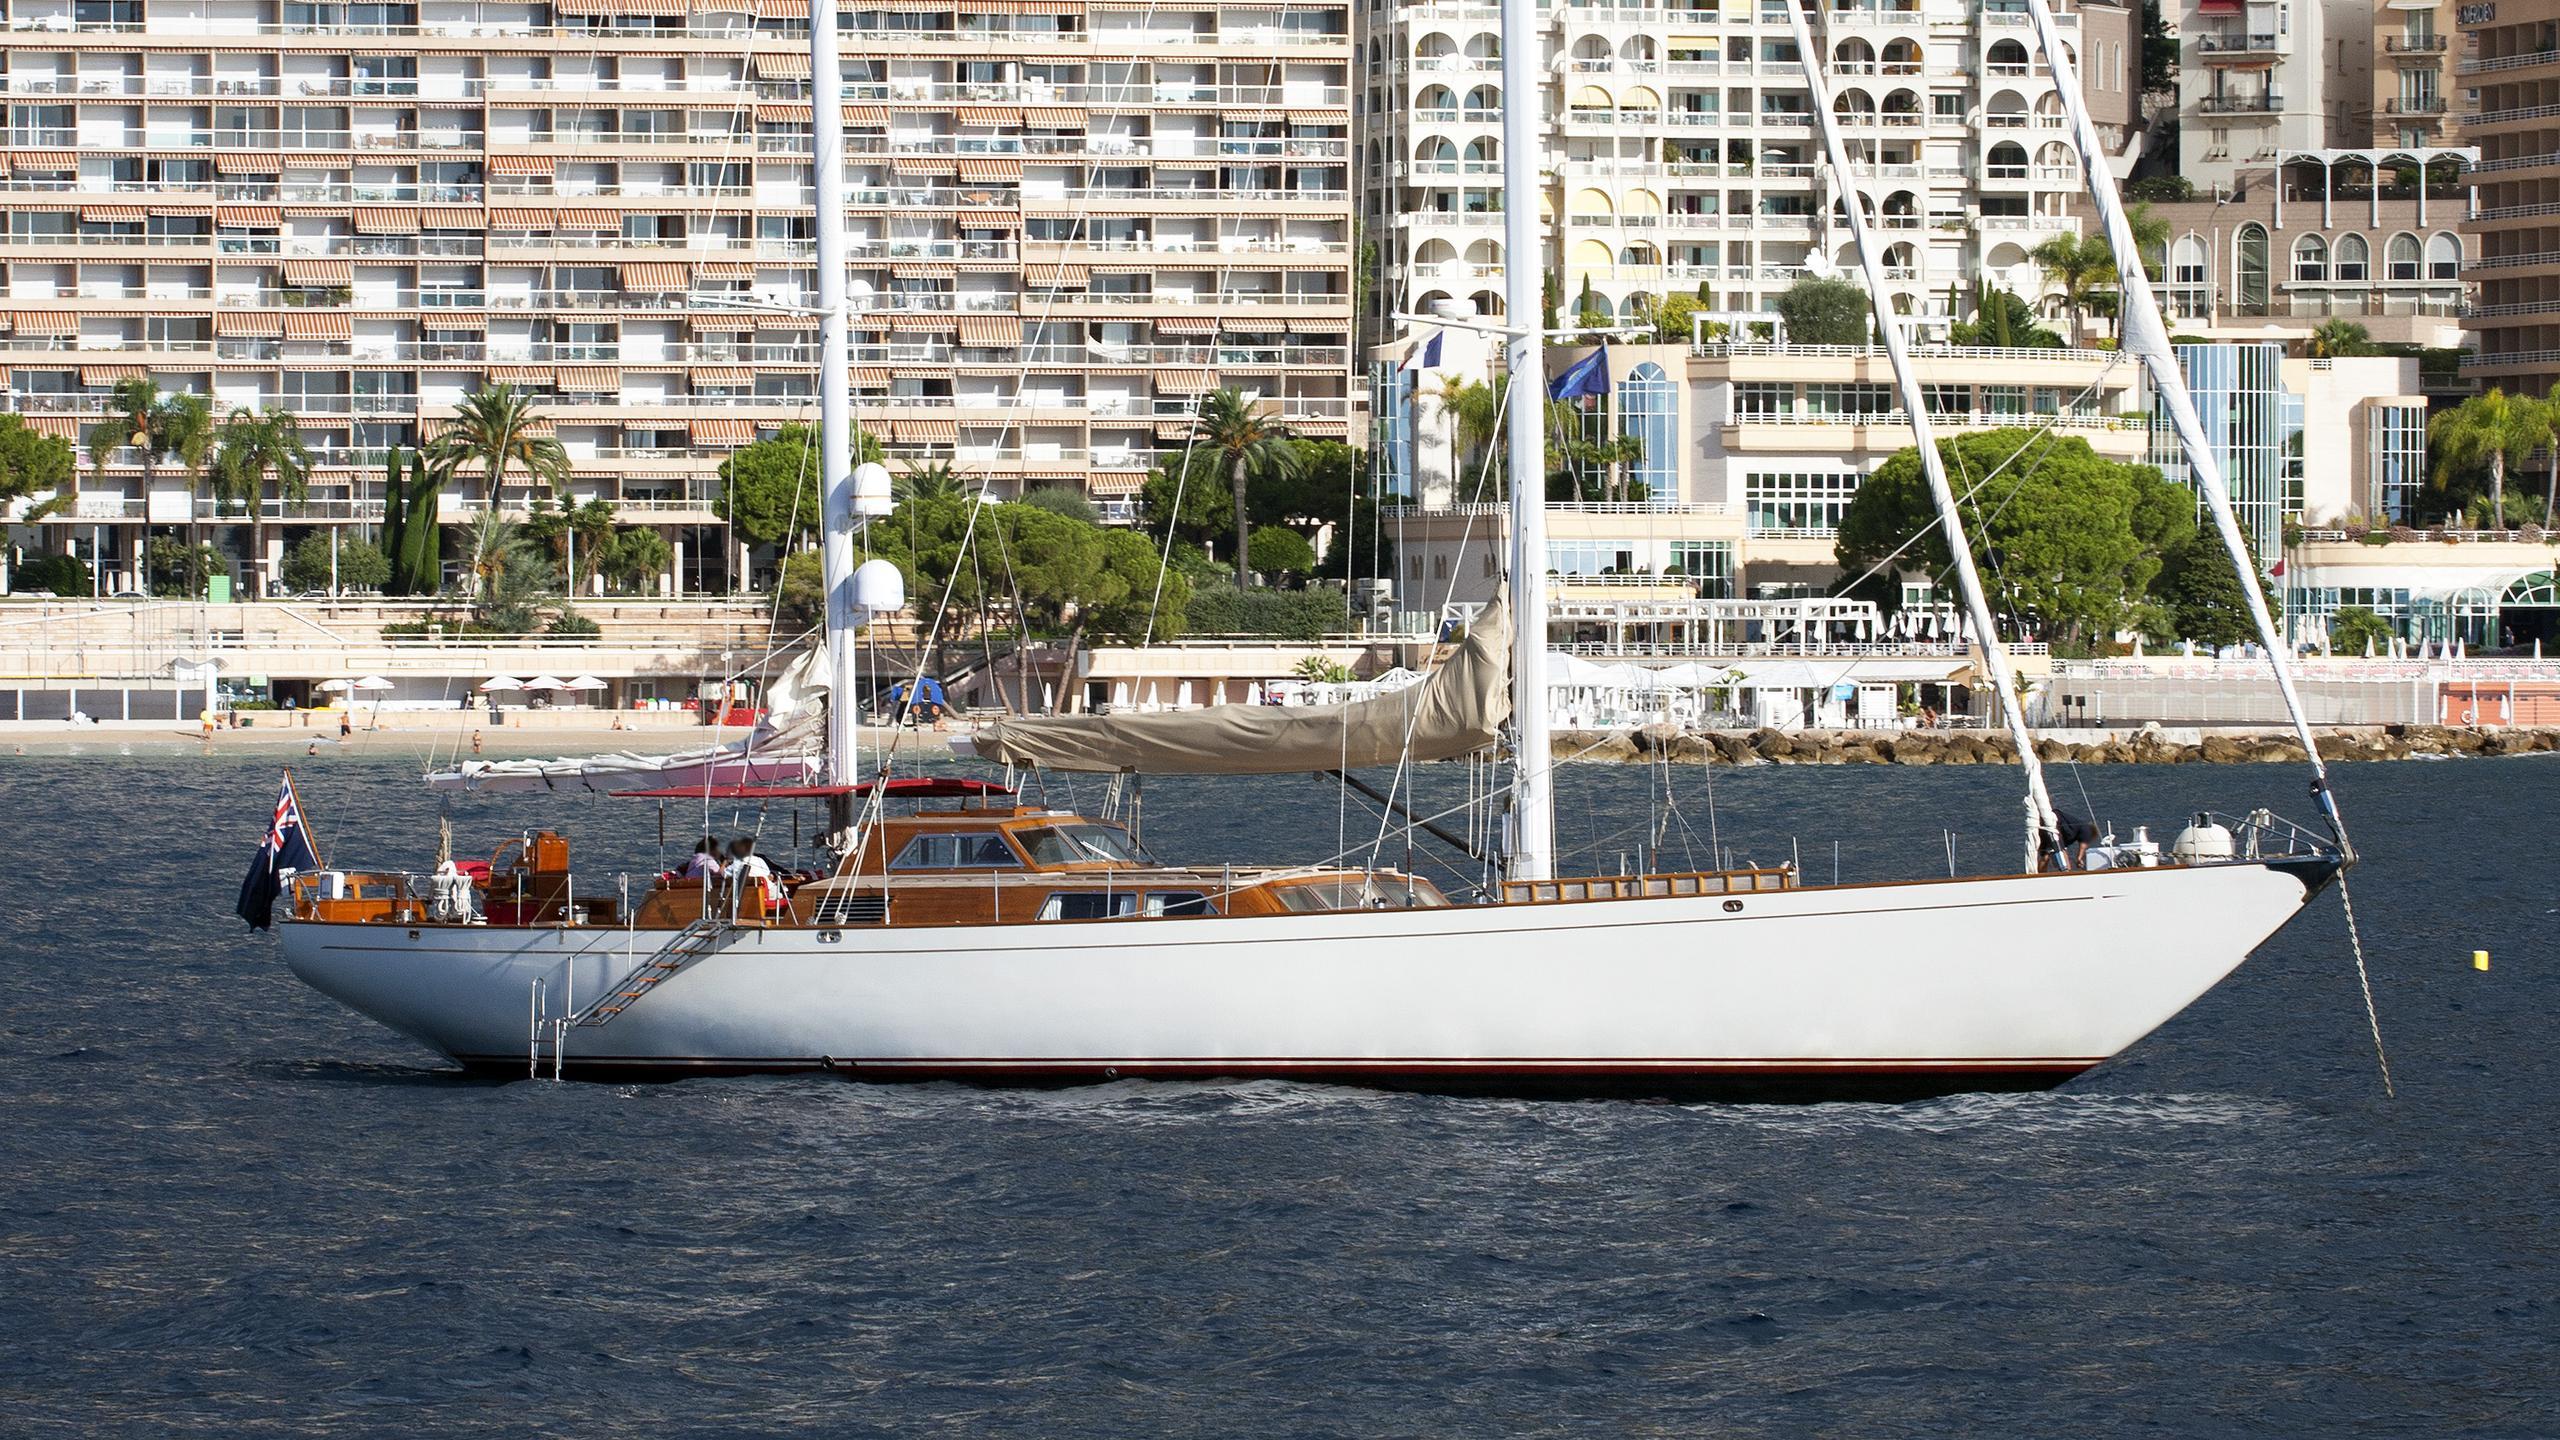 surama-sailing-yacht-beconcini-1974-32m-profile